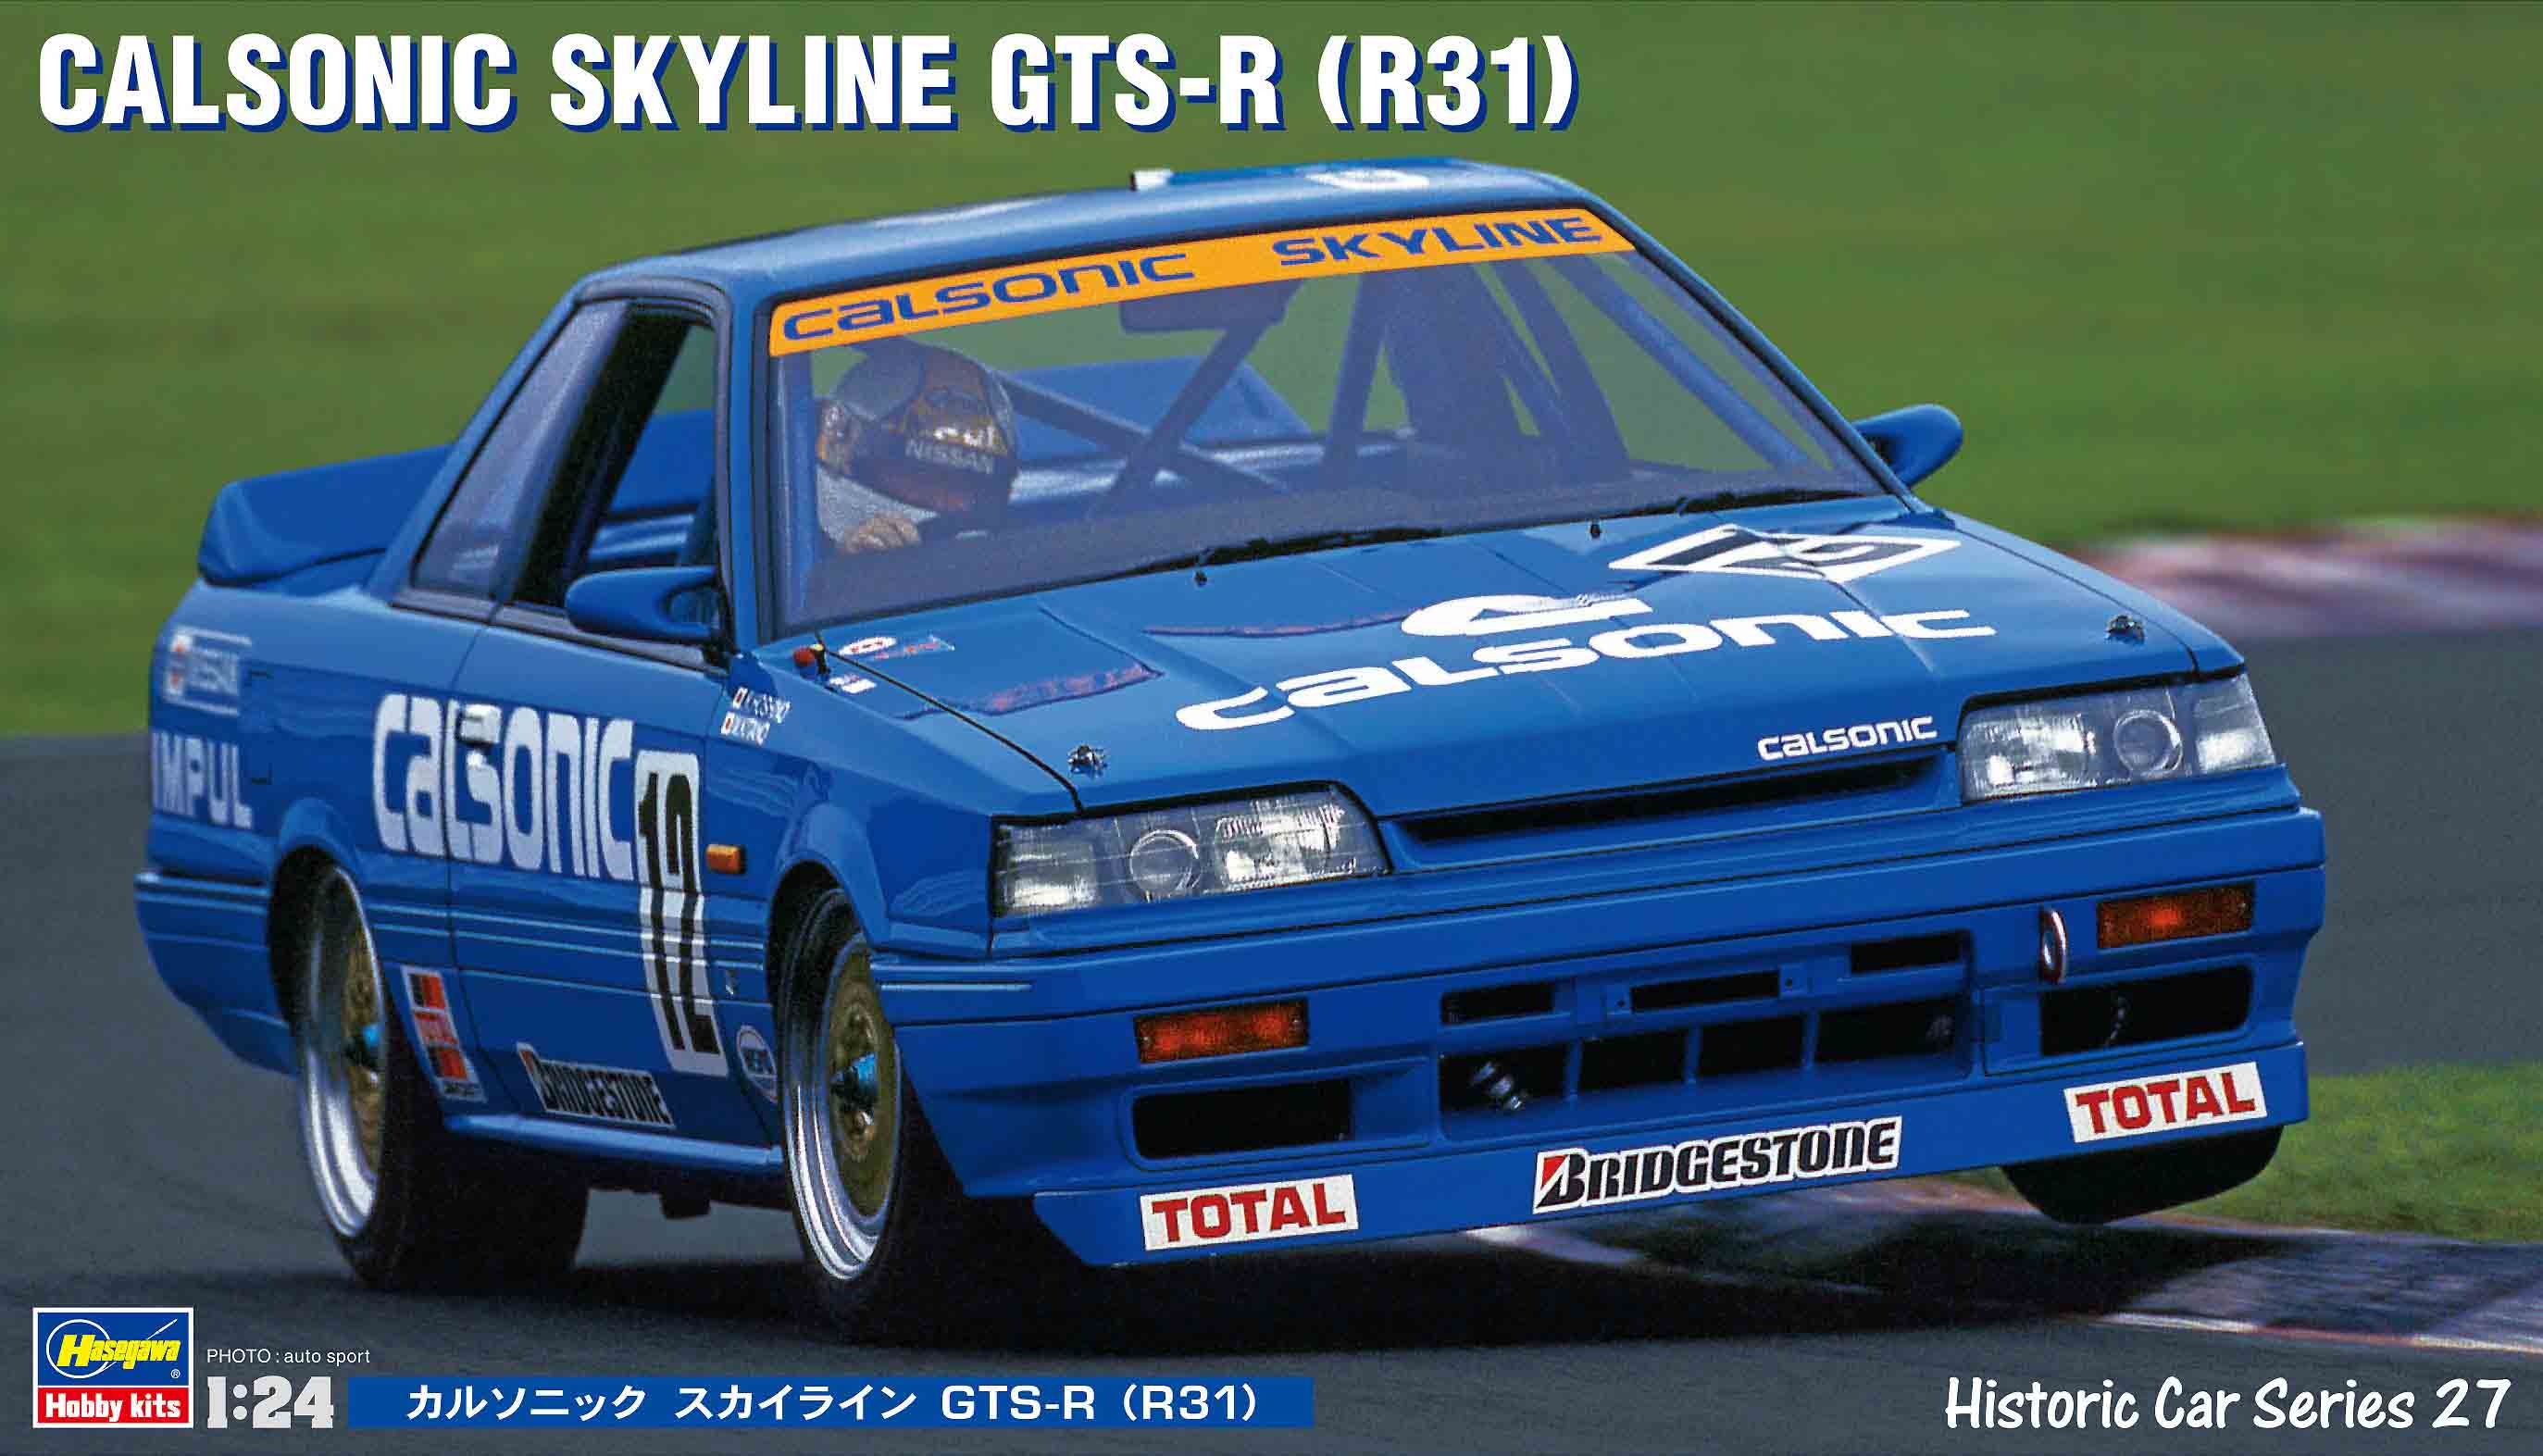 Hasegawa Calsonic Skyline Gts-R (R31) HC27